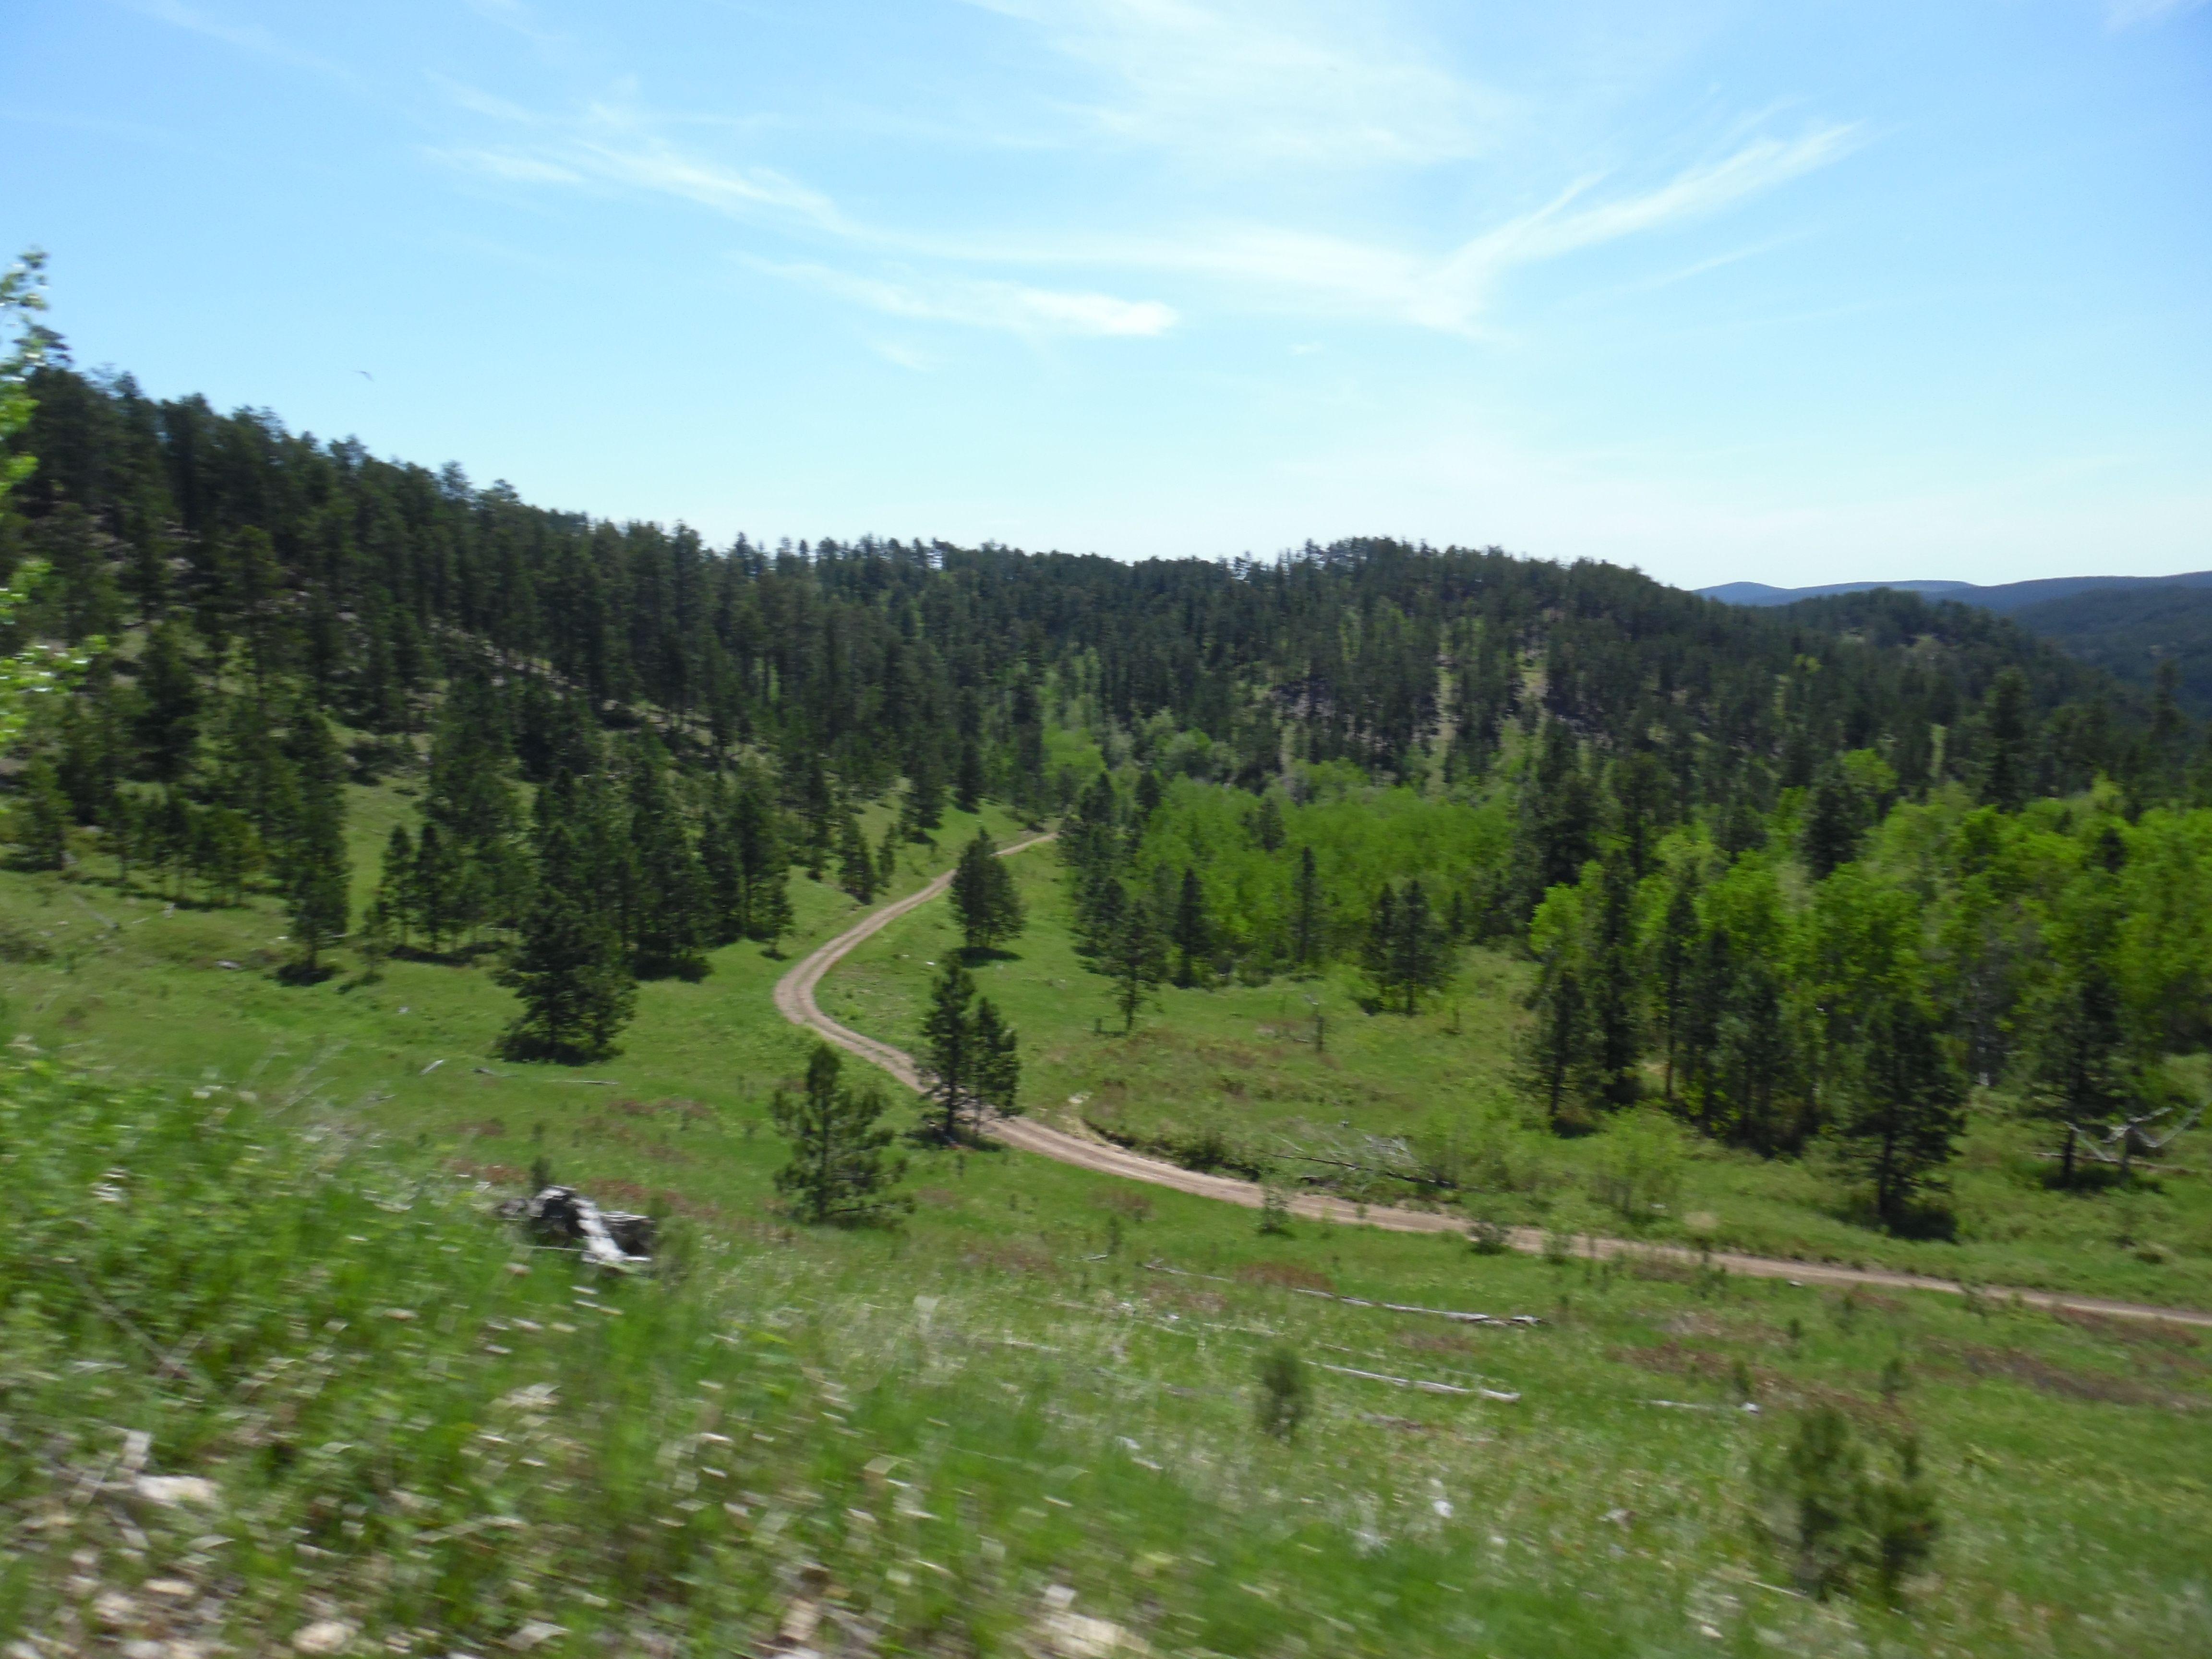 Atv trailheads black hills south dakota natural landmarks